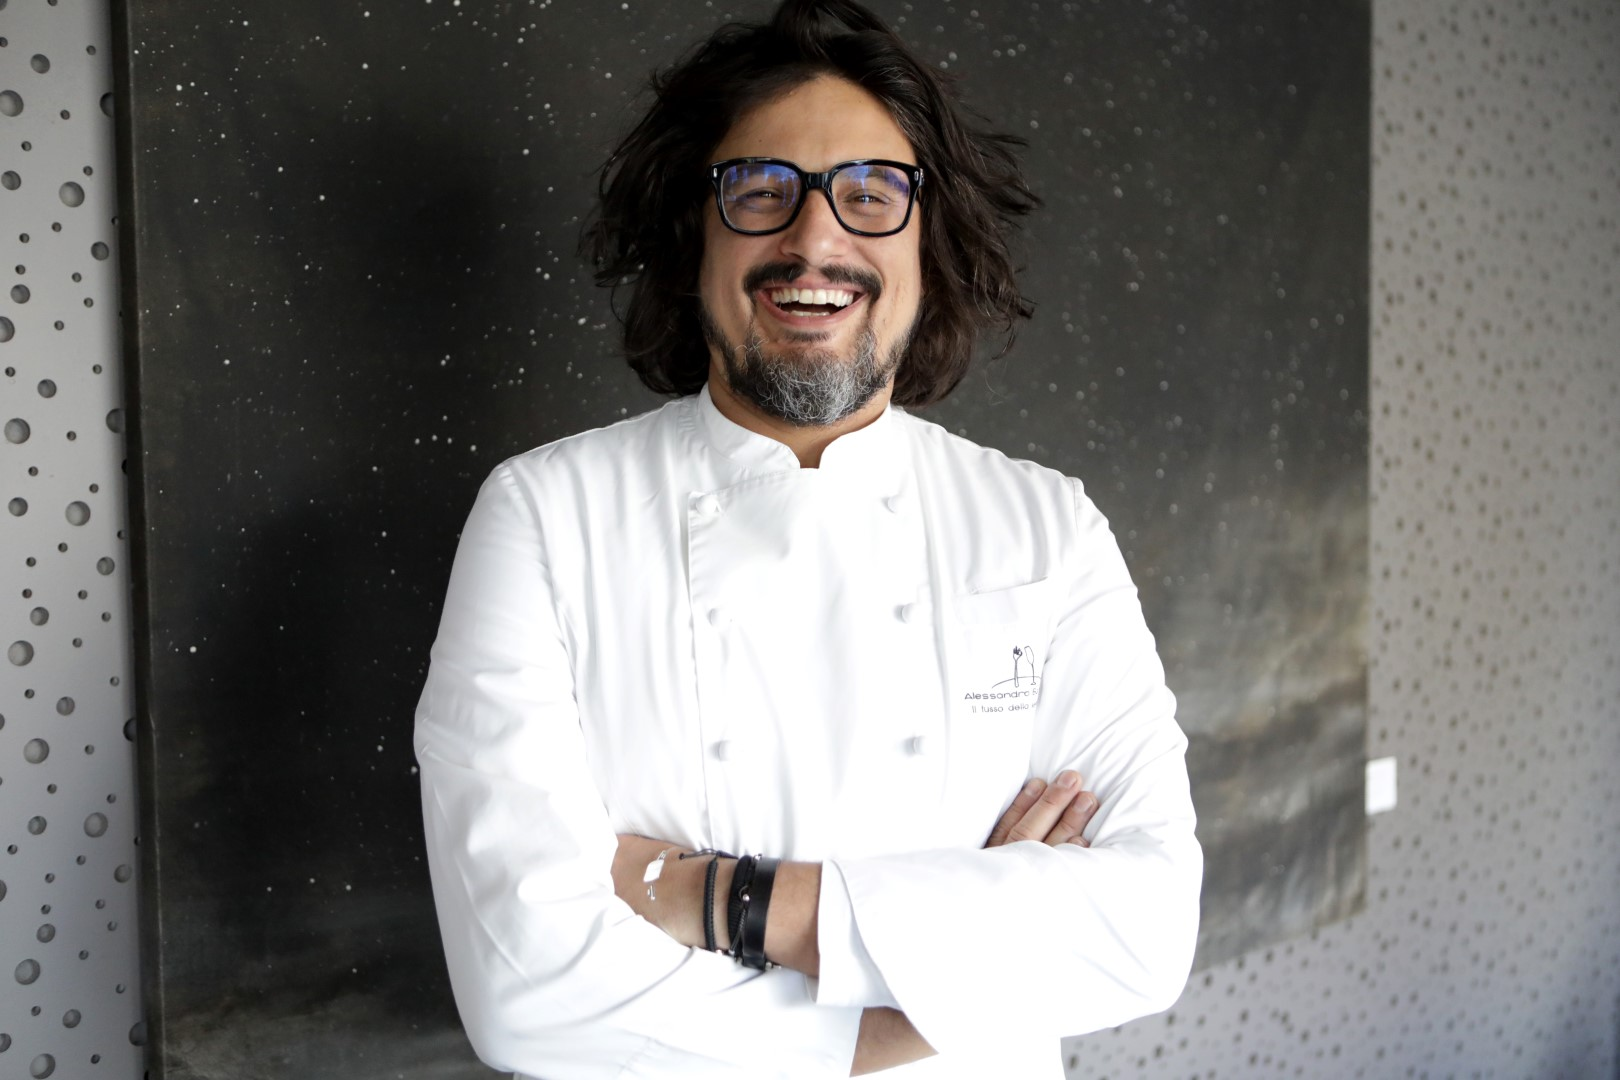 Fielmann Alessandro Borghese 2019